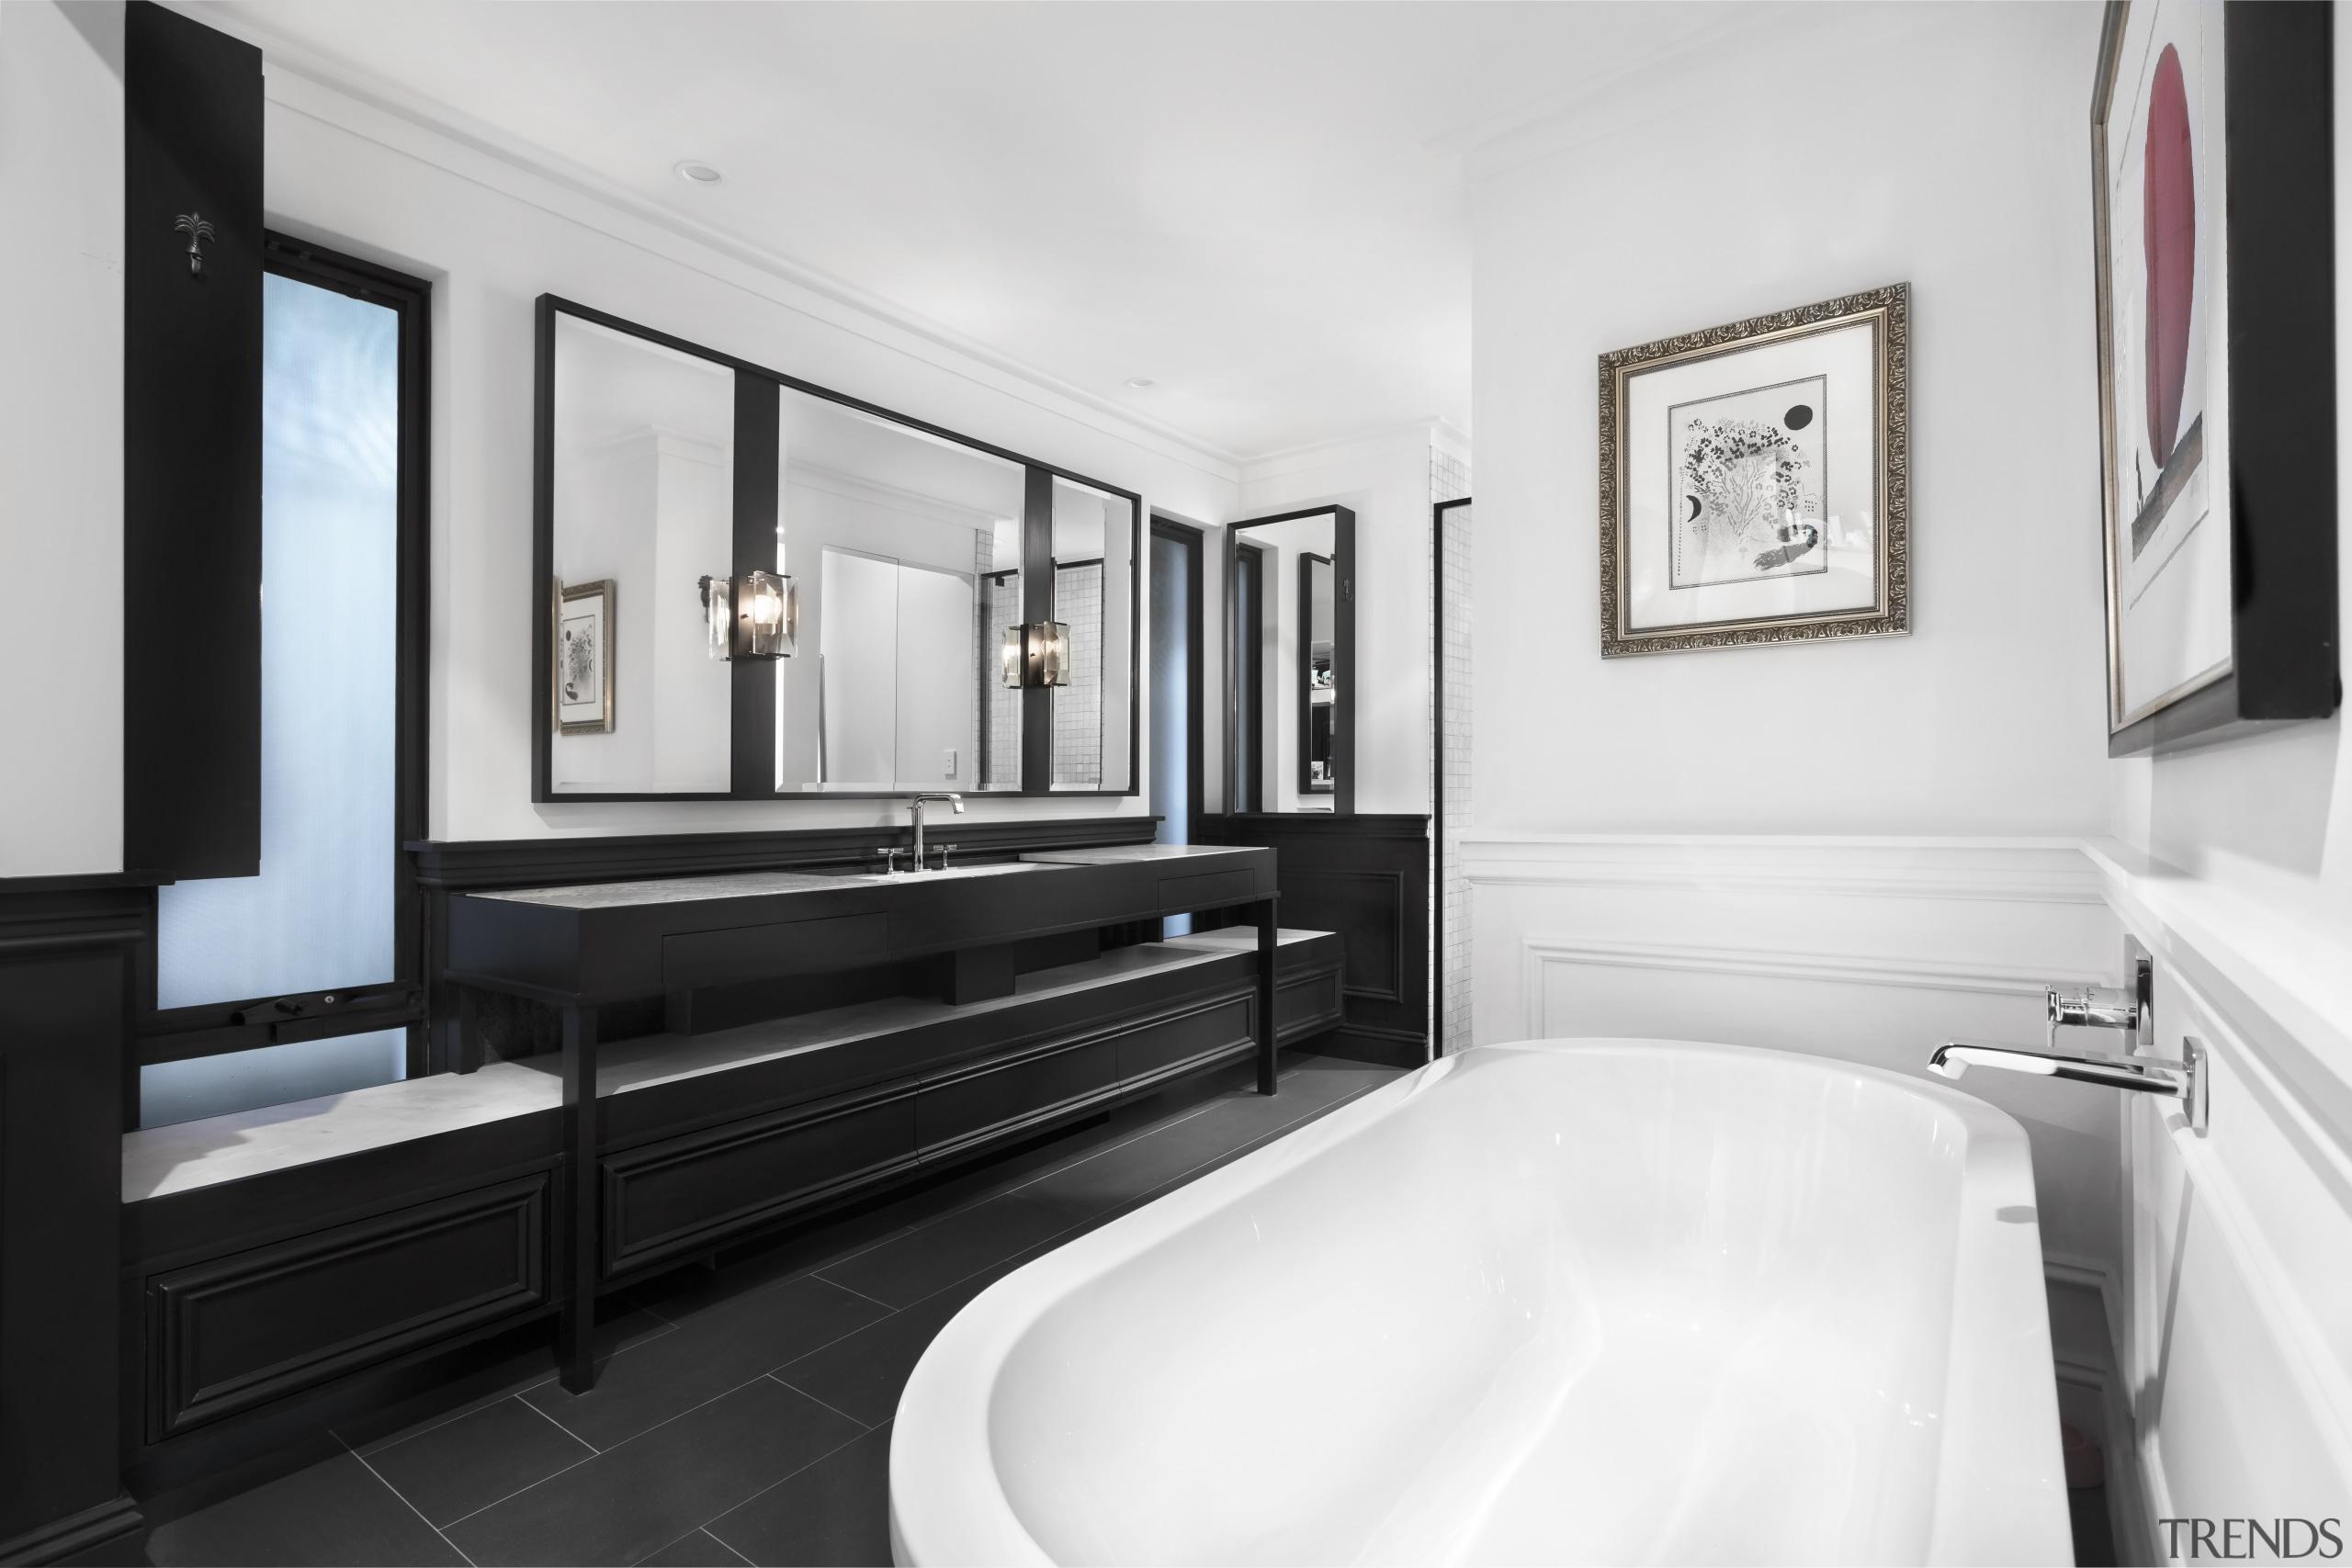 Nz3405Leonhouse–268574082–05 - bathroom | floor | interior design bathroom, floor, interior design, room, suite, white, black